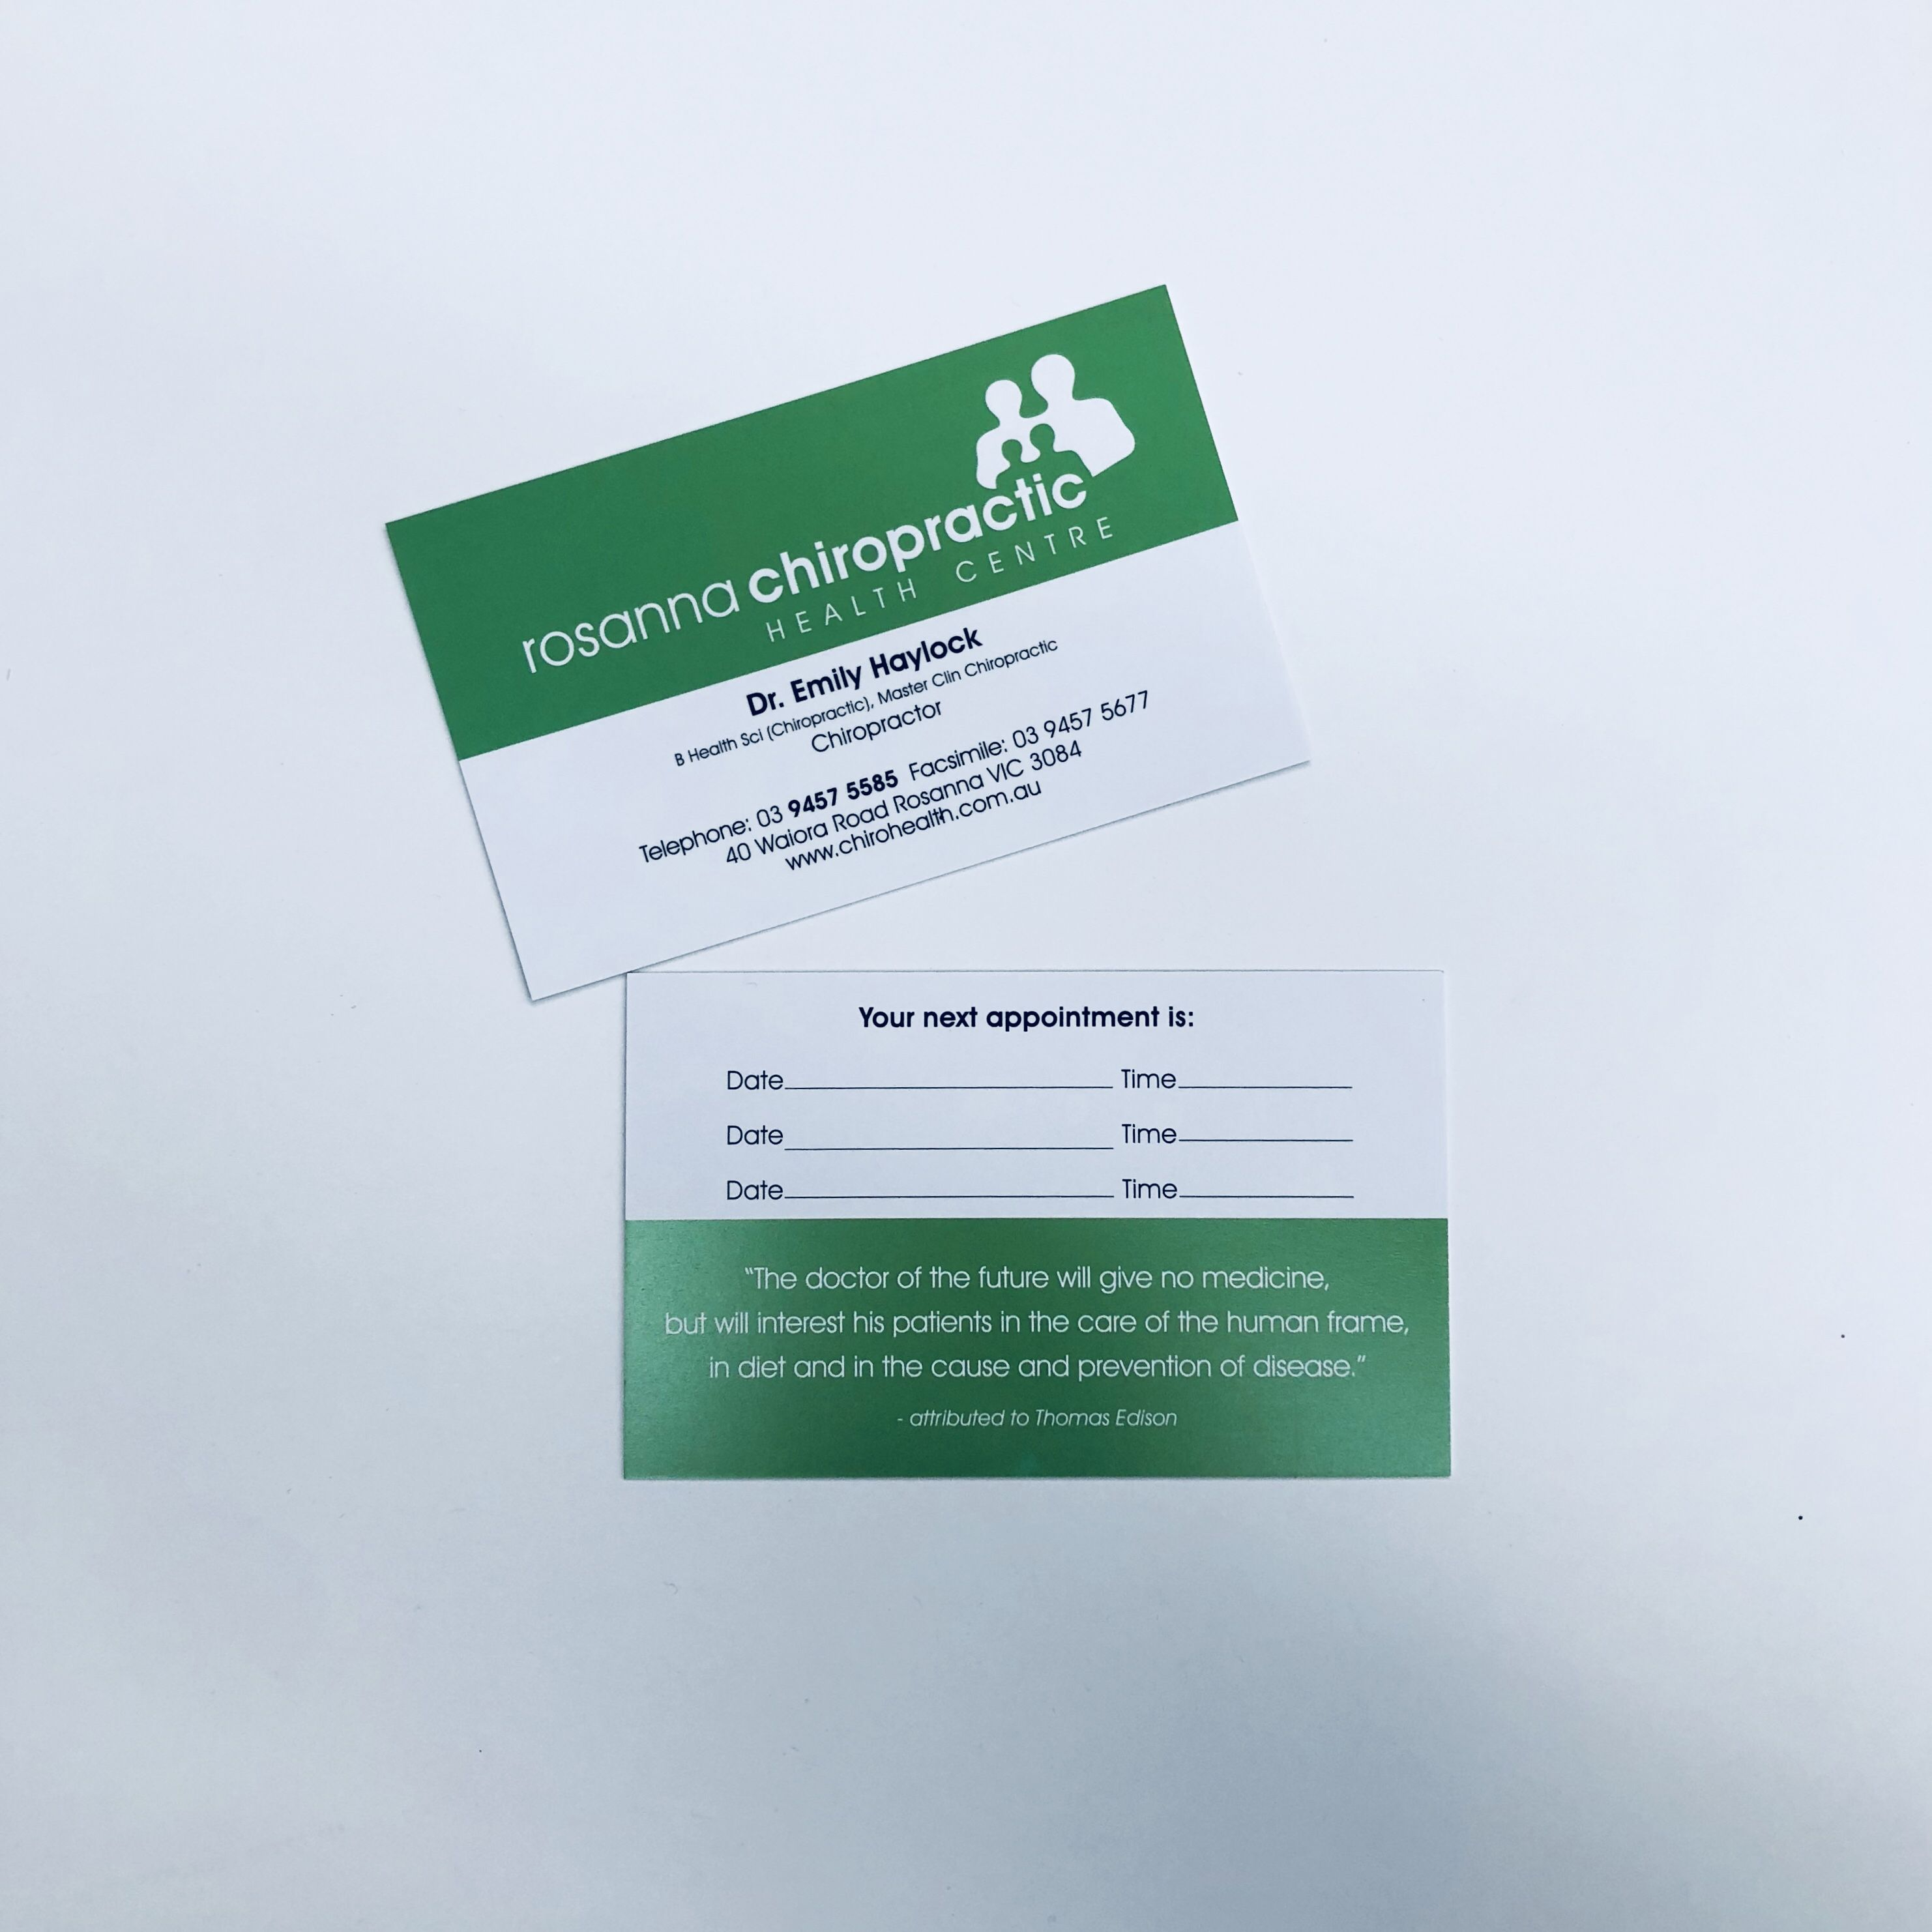 Matte Laminated Business Cards Printed For Webtasticdesigns Com Au Thank You Printing Business Cards Laminated Business Cards Web Design